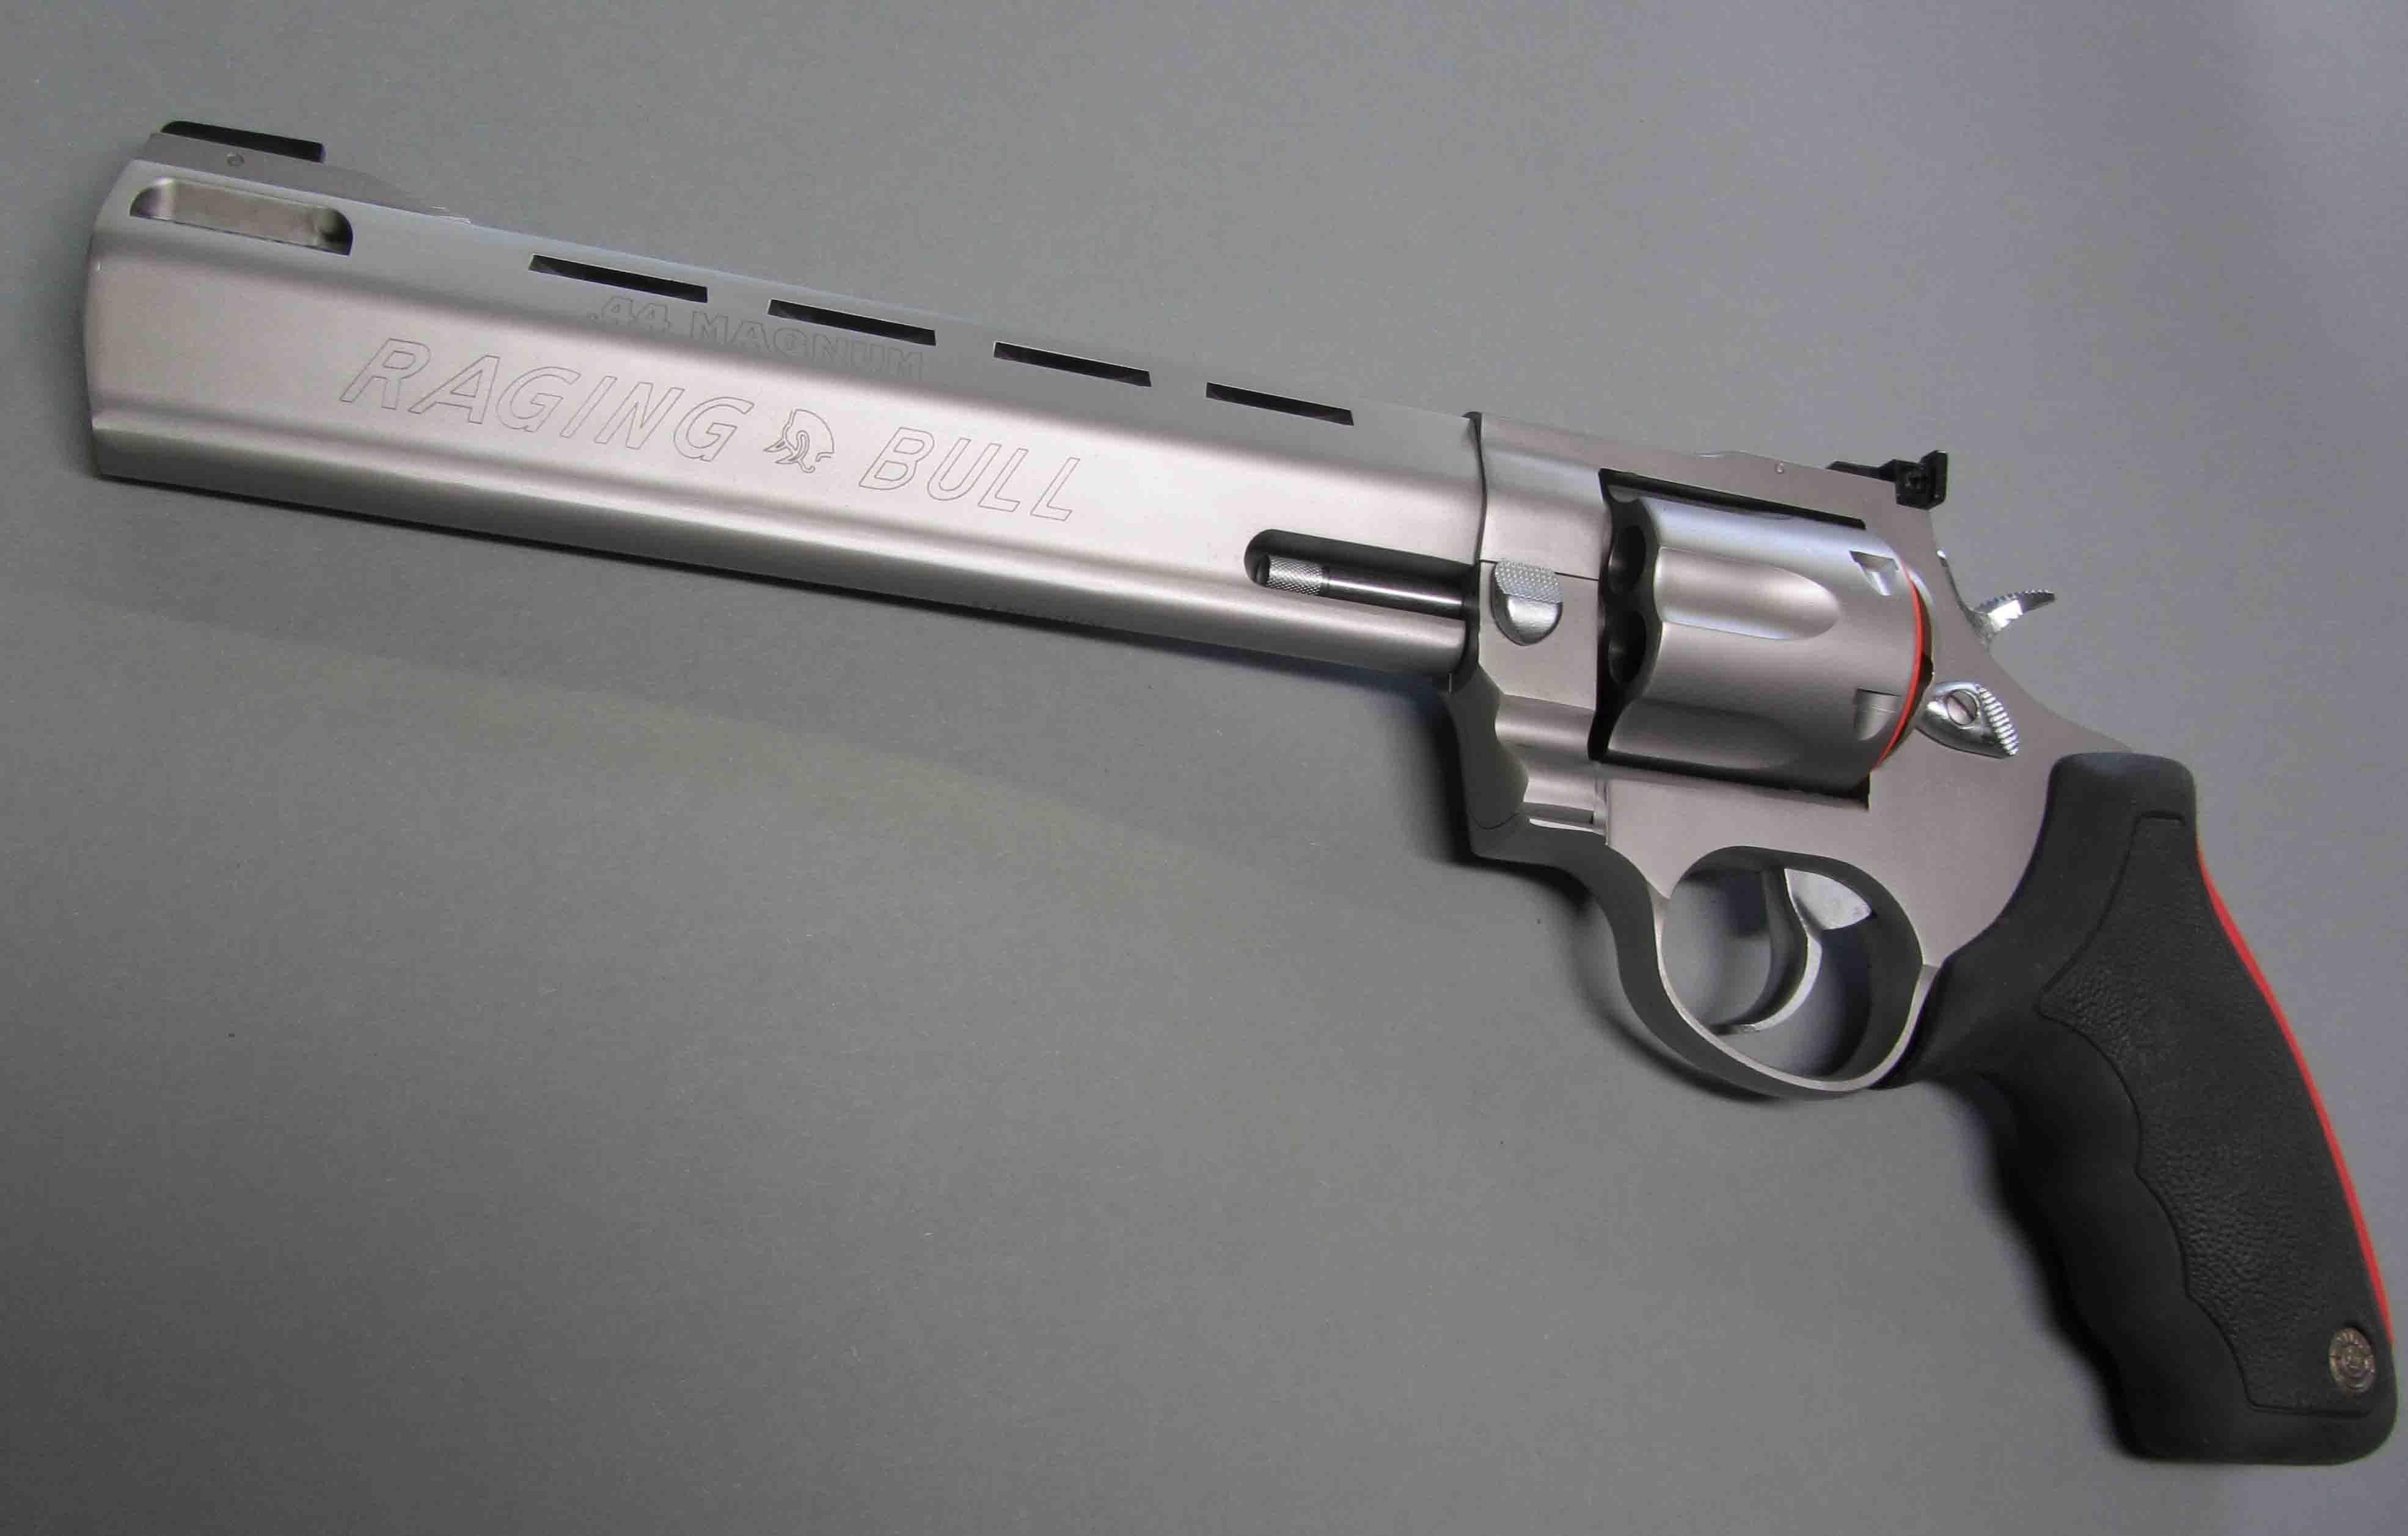 Download Wallpaper Red Black Bull Weapon Gun Taurus Well